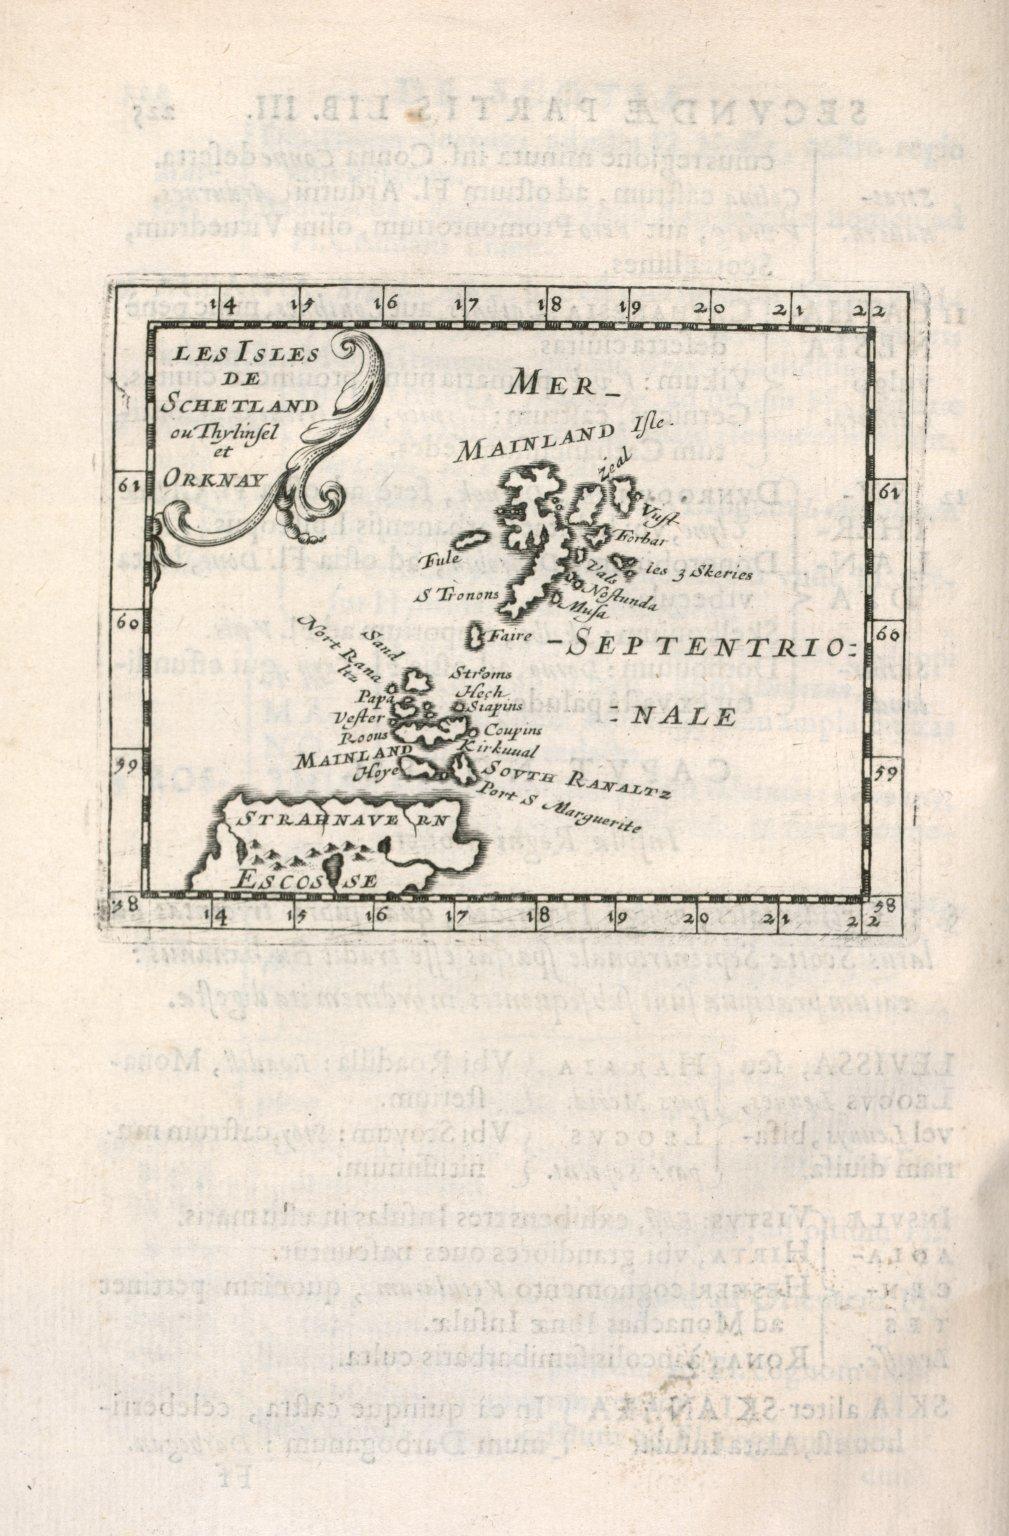 Les Isles de Schetland ou Thylinsel et Orknay [1 of 1]